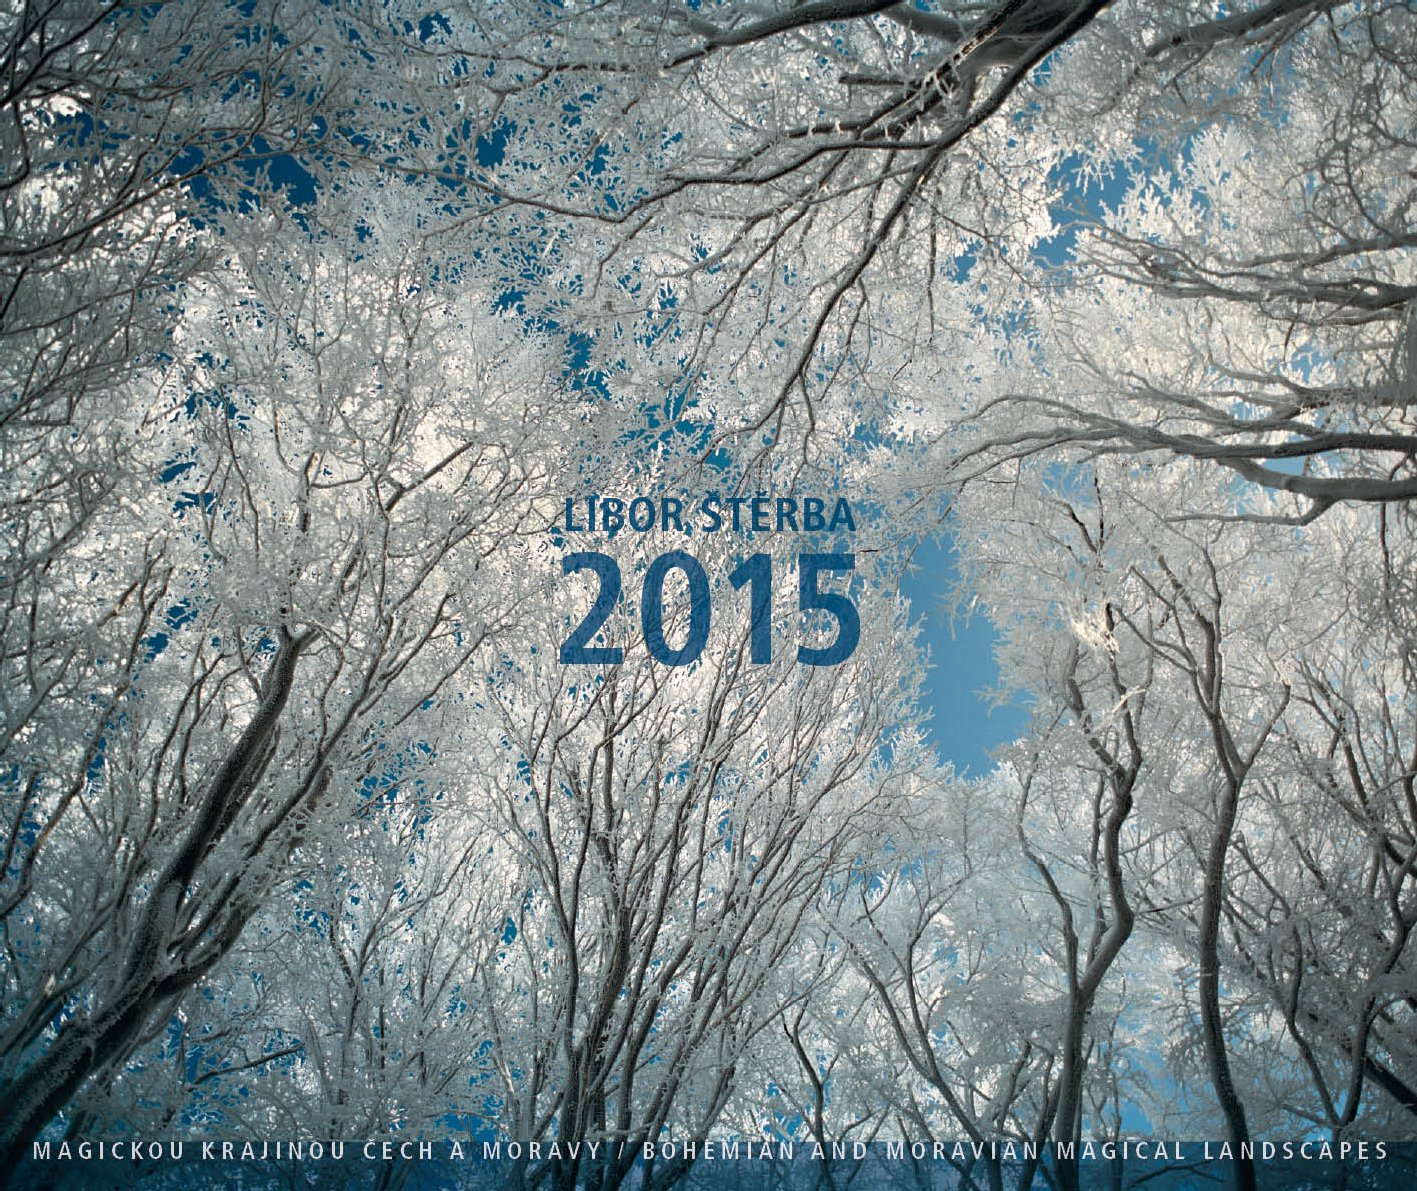 Kalendář Libor Šterba 2015